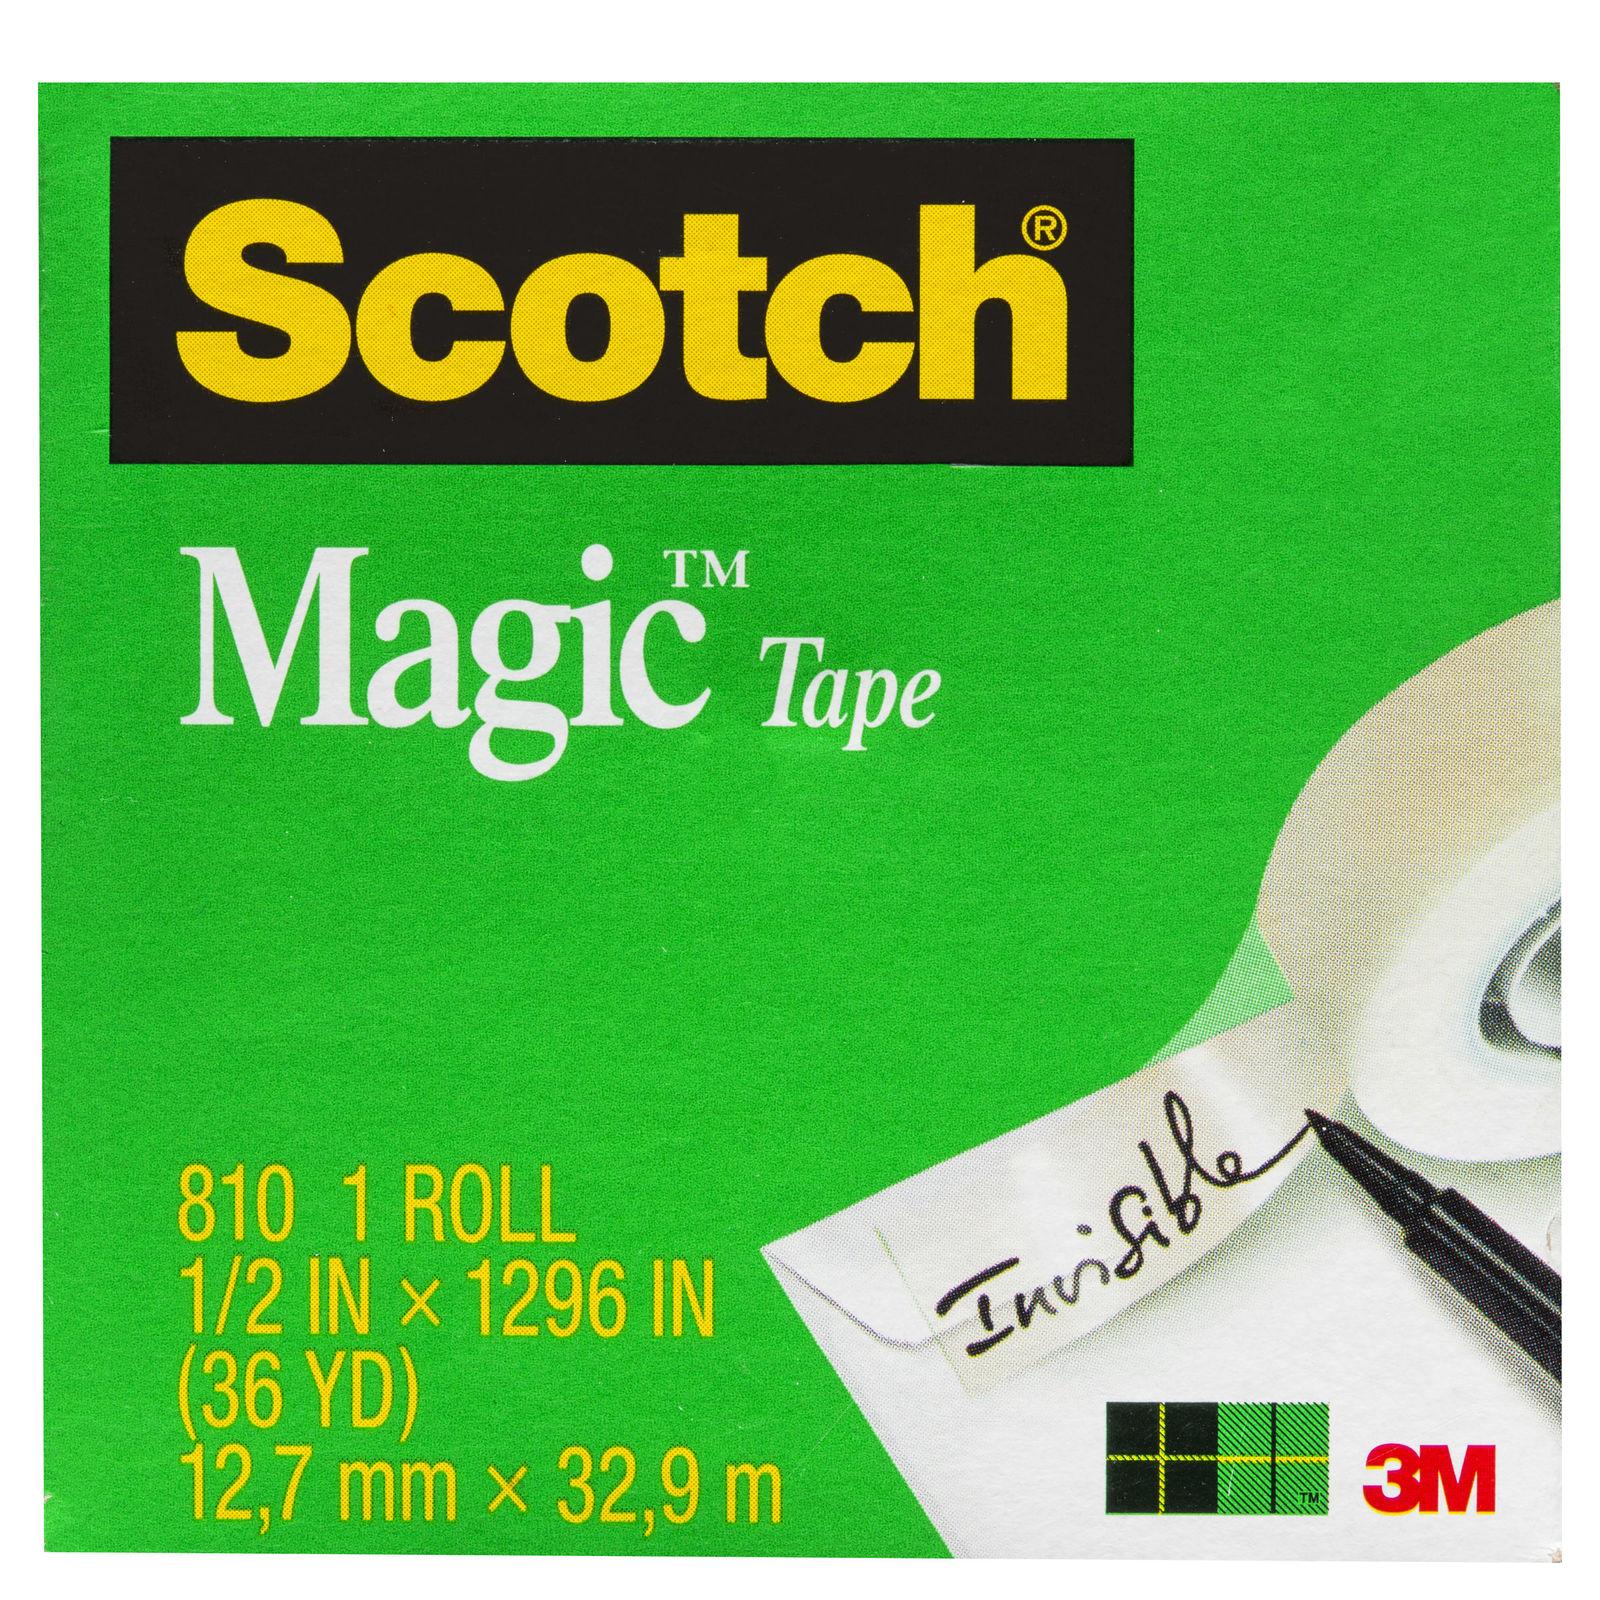 Scotch Magic Tape (12.7mm x 33m) image